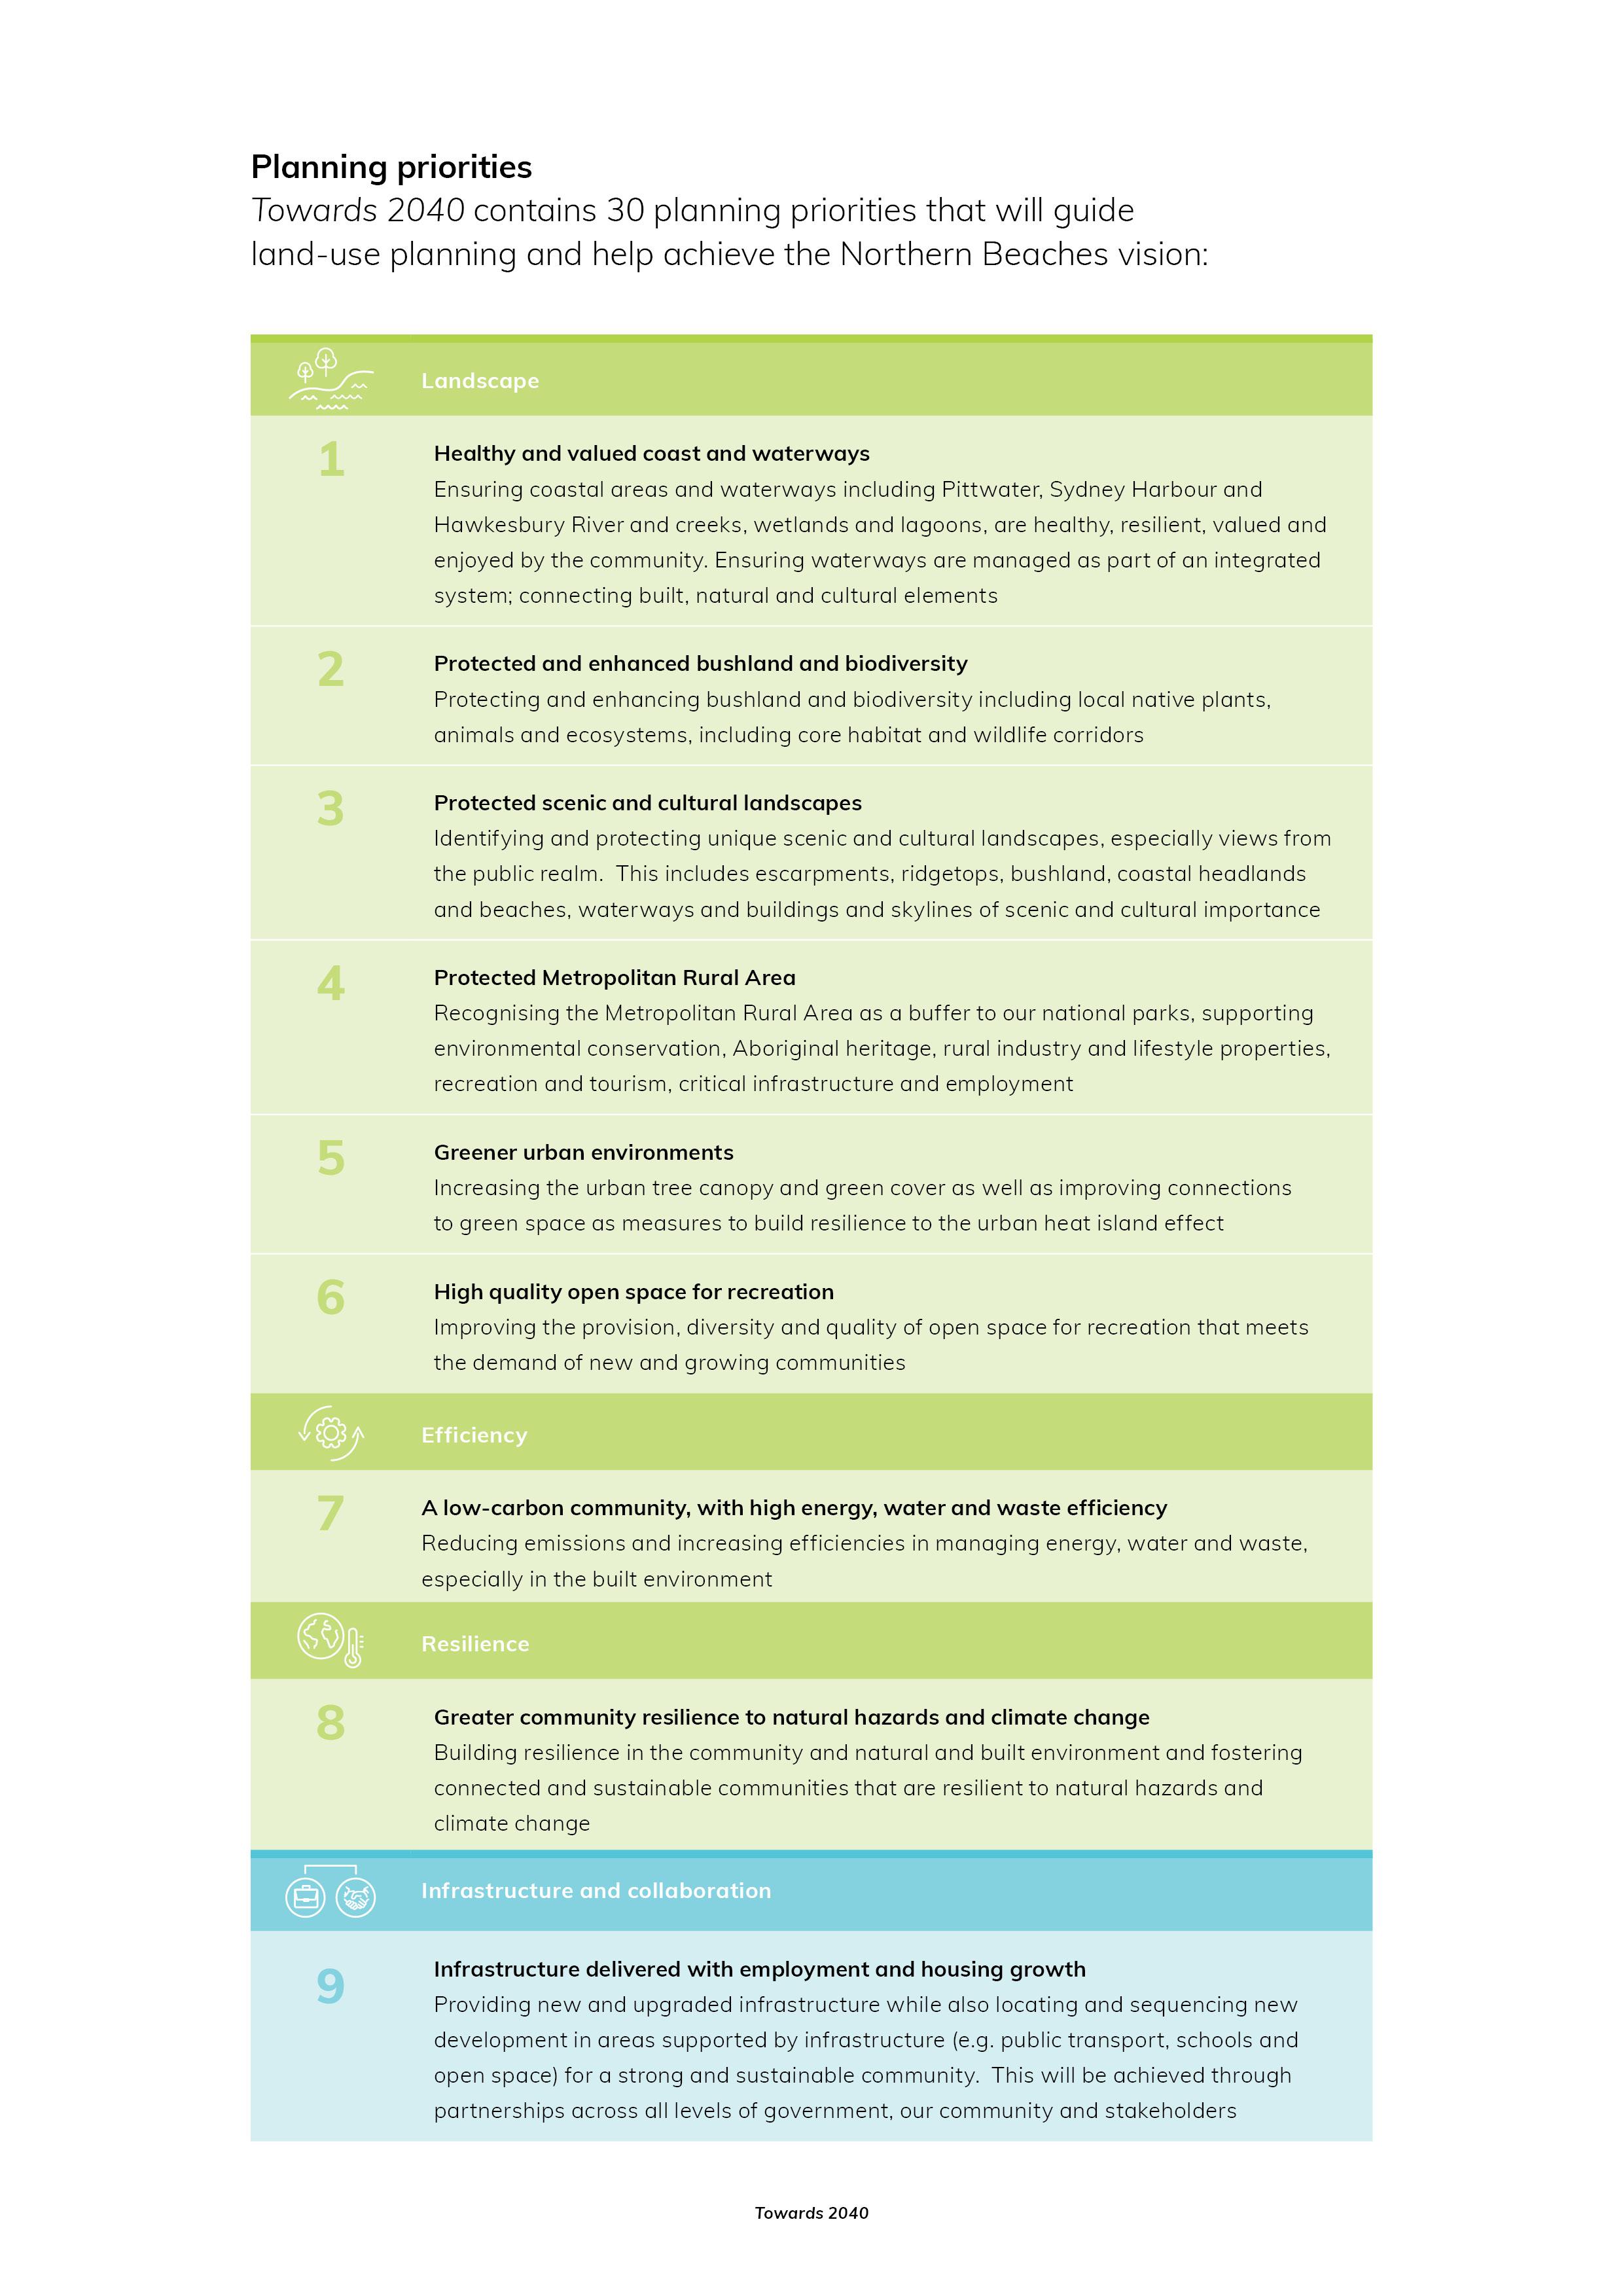 Draft priorities page 1 of 3